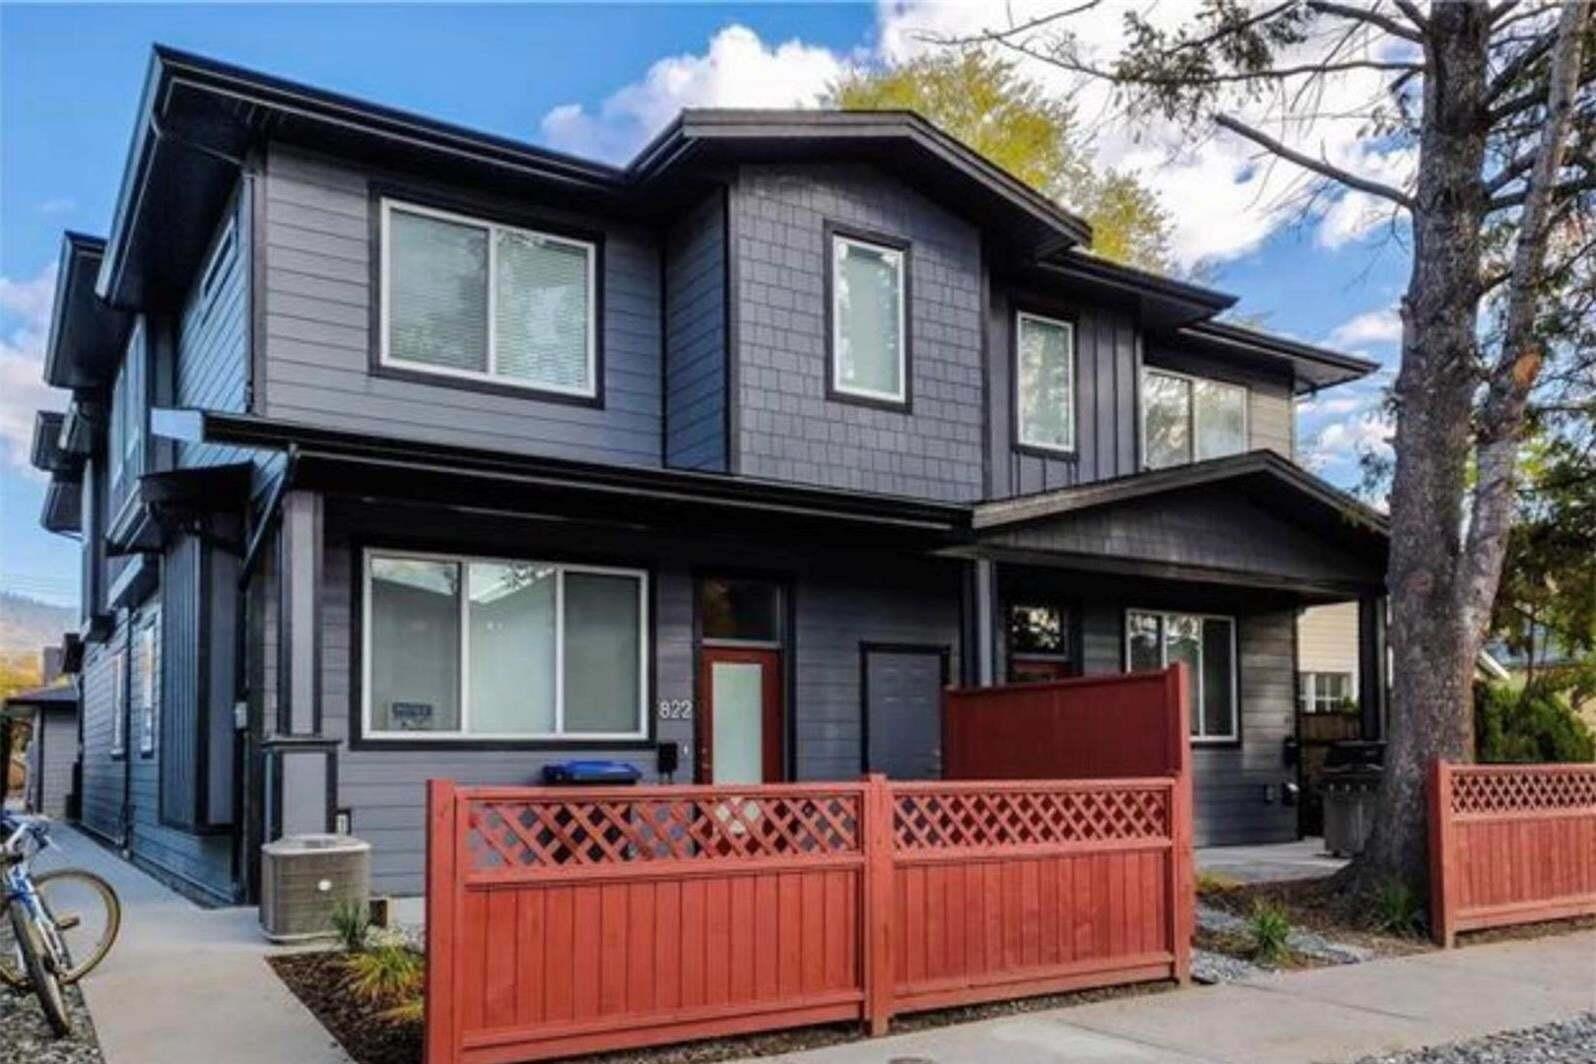 Townhouse for sale at 820 Fuller Ave Kelowna British Columbia - MLS: 10215434